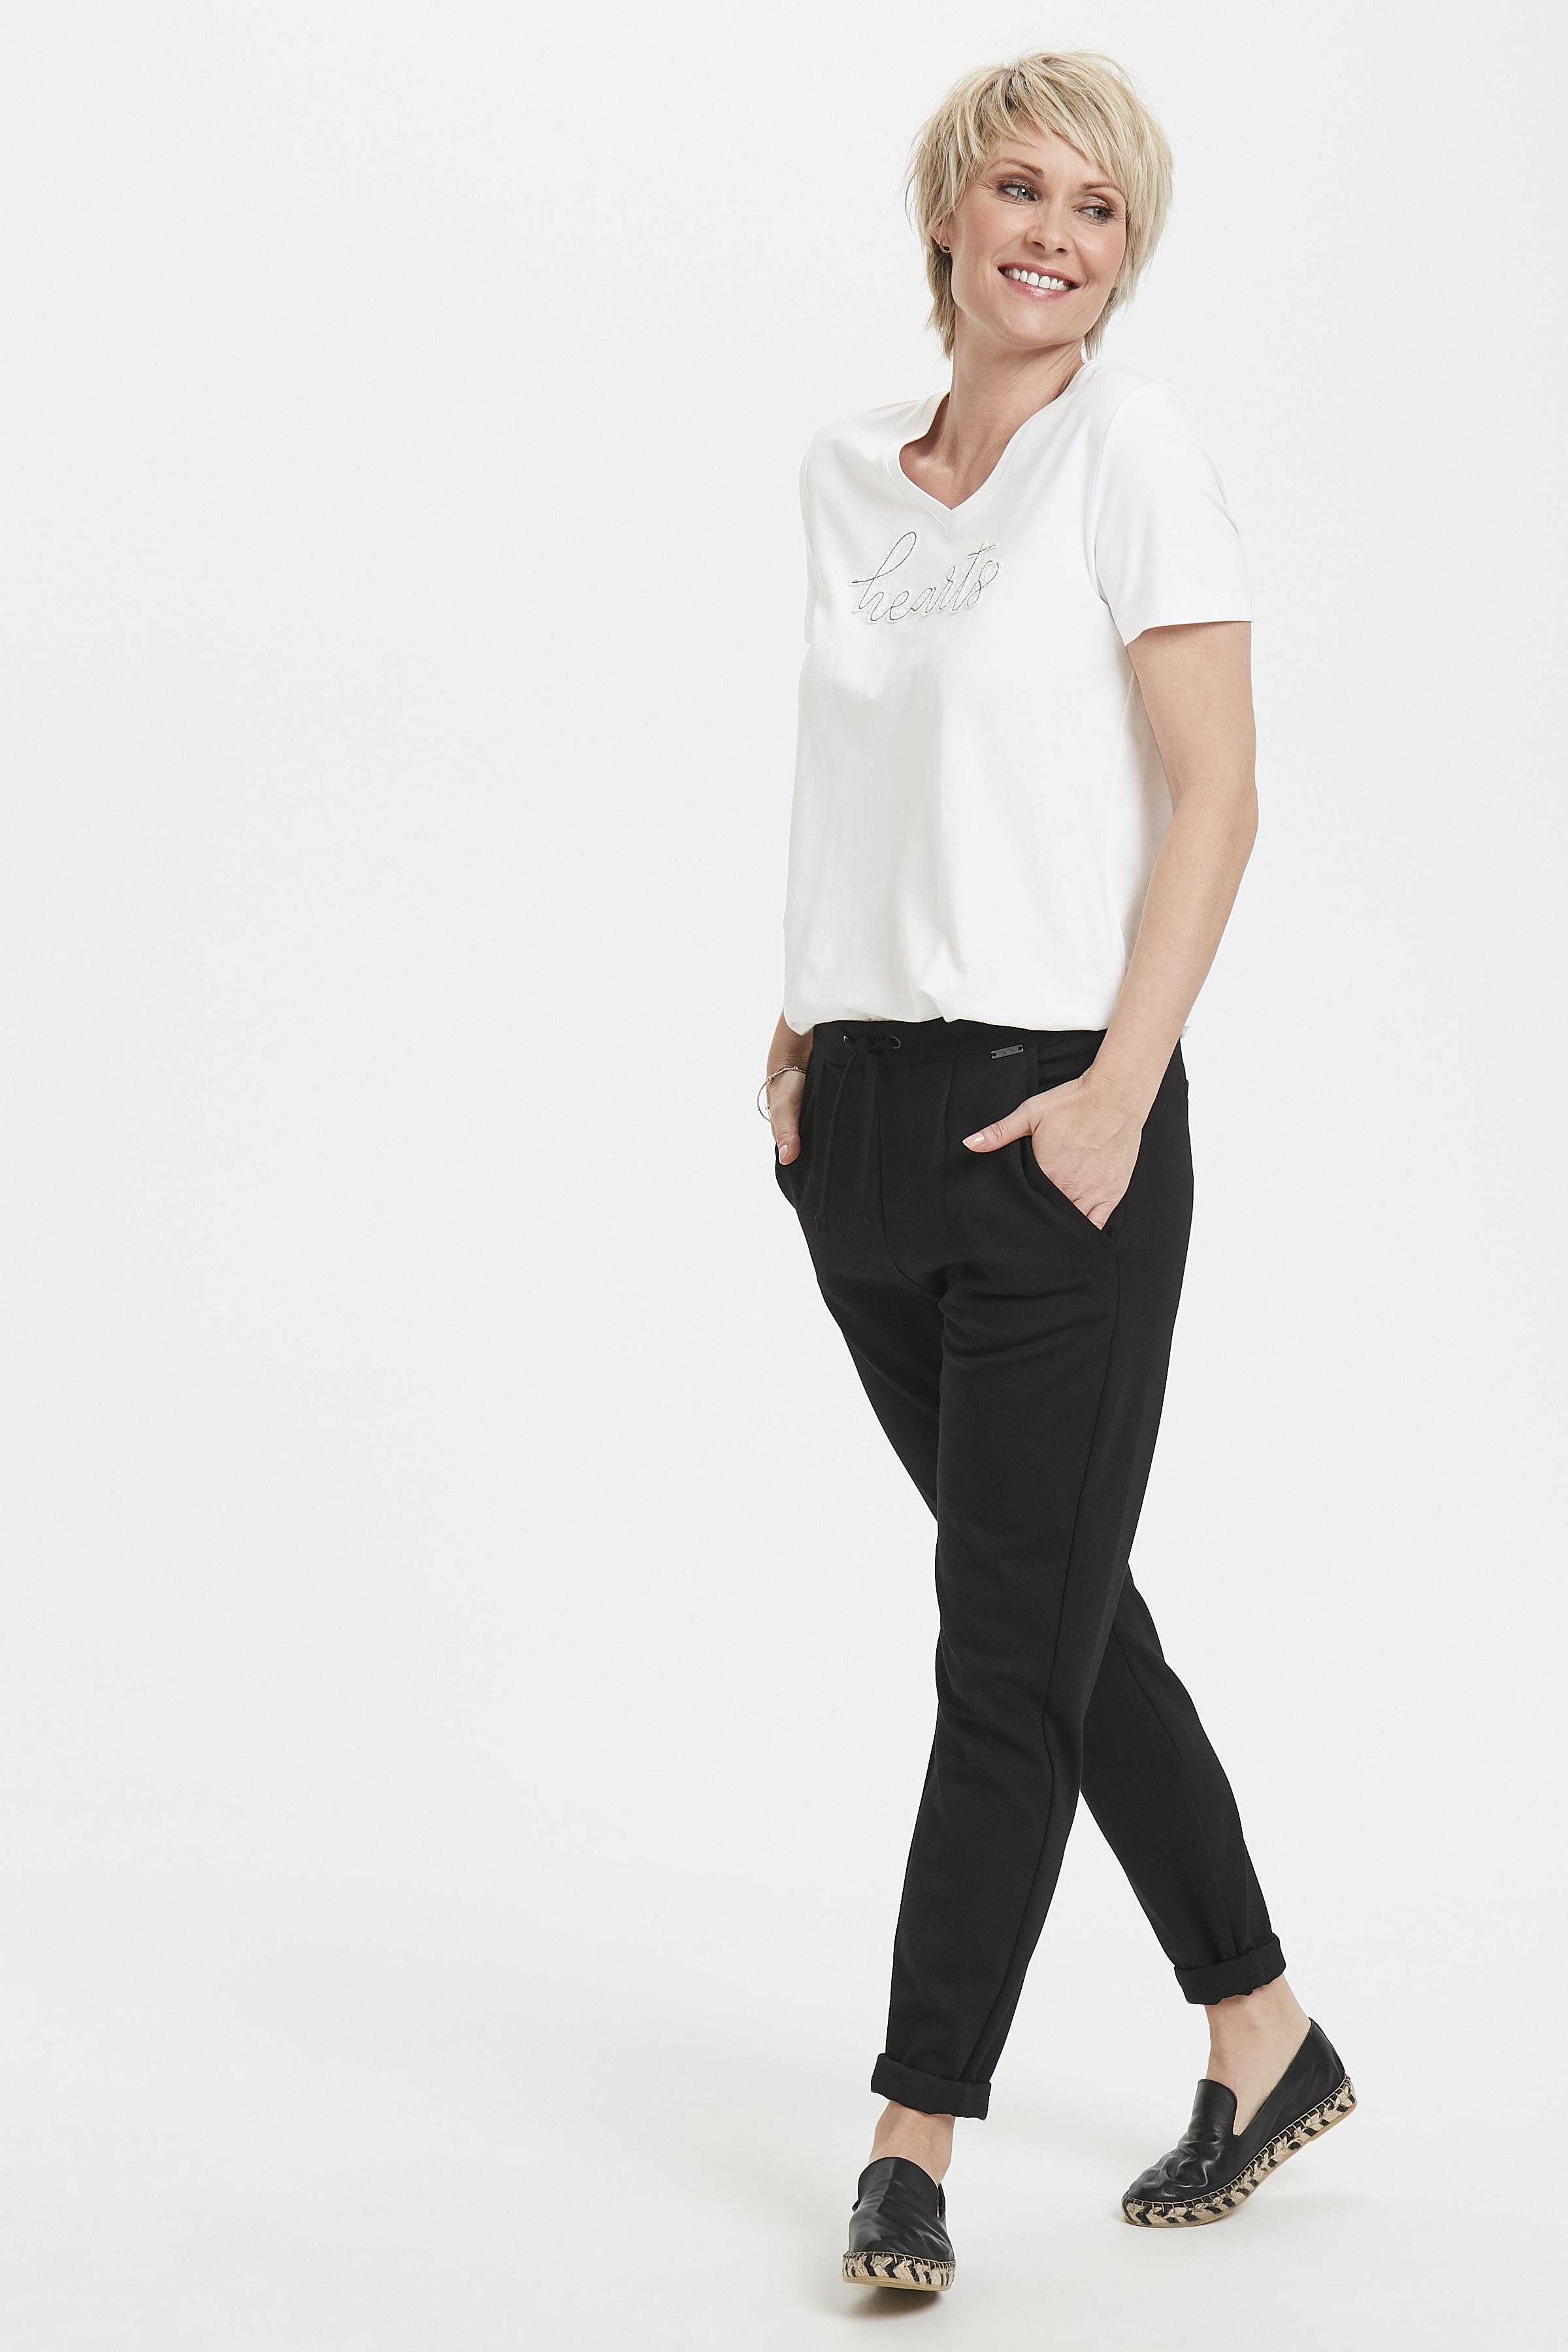 Off-white Korte mouwen T-shirt  van Bon'A Parte – Door Off-white Korte mouwen T-shirt  van maat. S-2XL hier